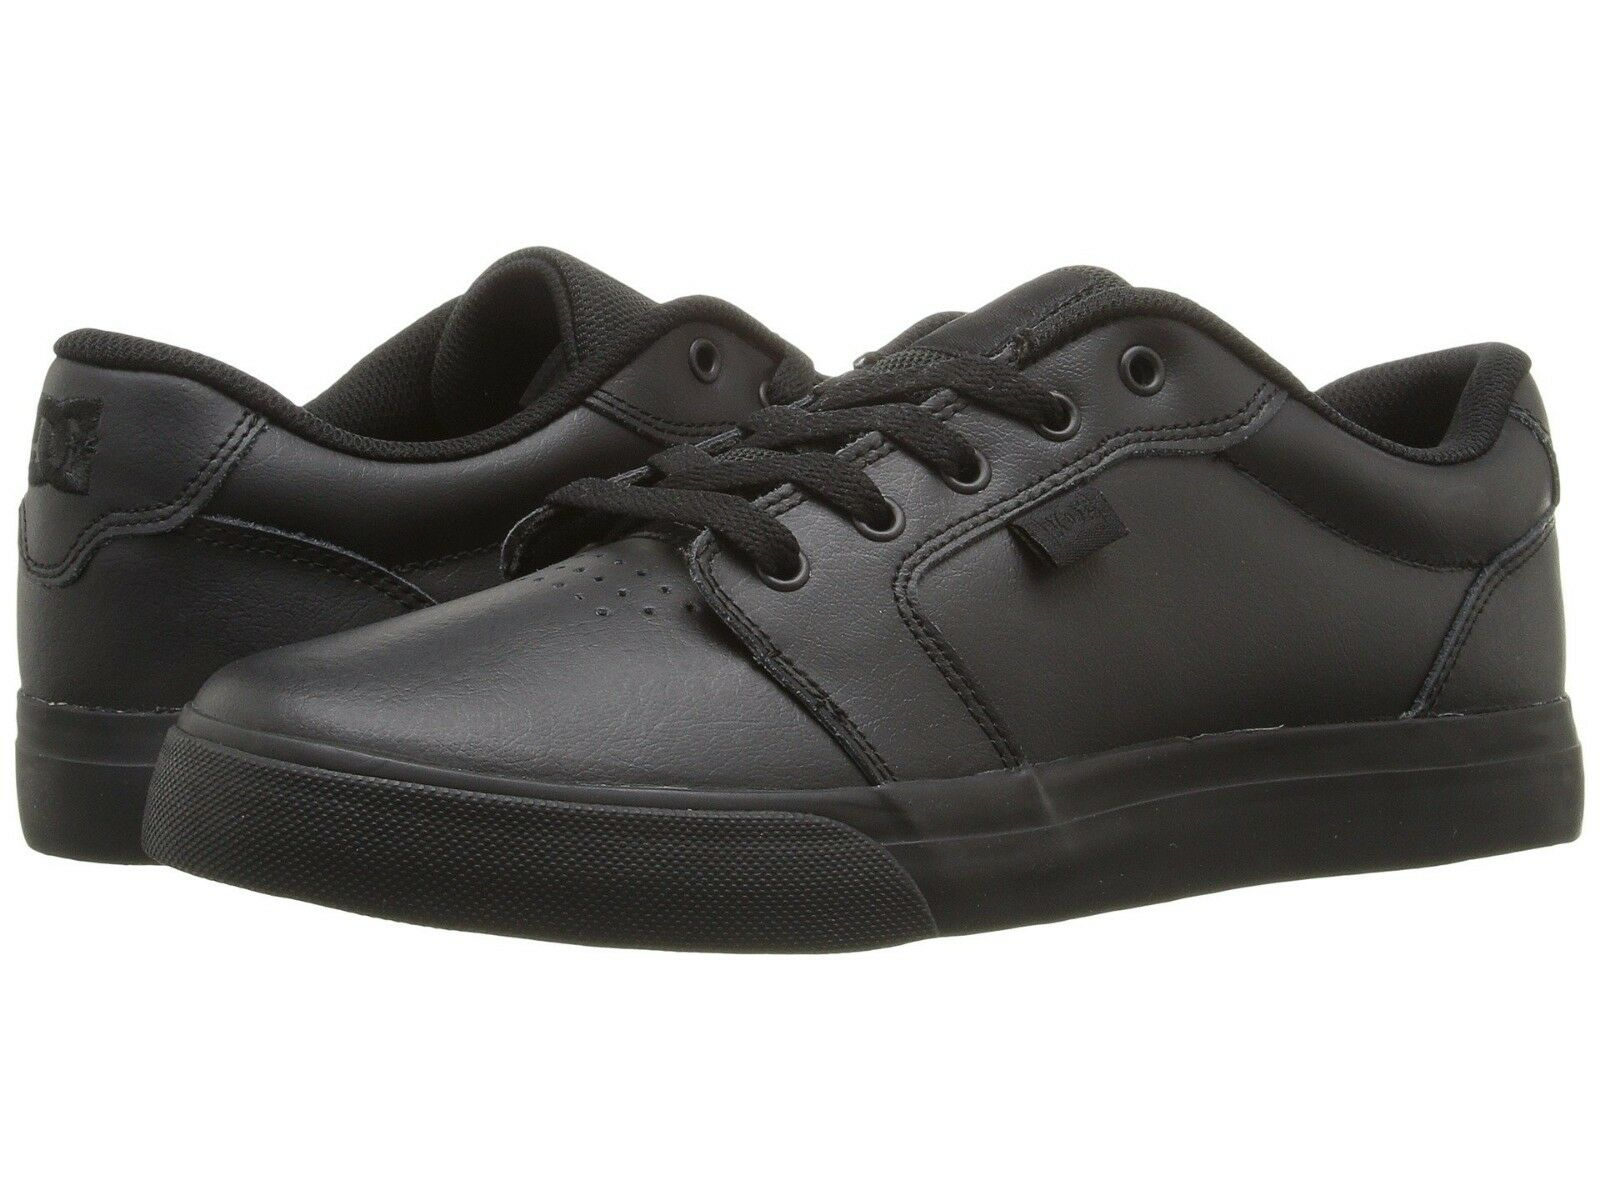 huge discount 00a01 fdde3 DC Anvil Anvil Anvil SE Shoes Leather Black Black For Men s New In Box  300147 22e164